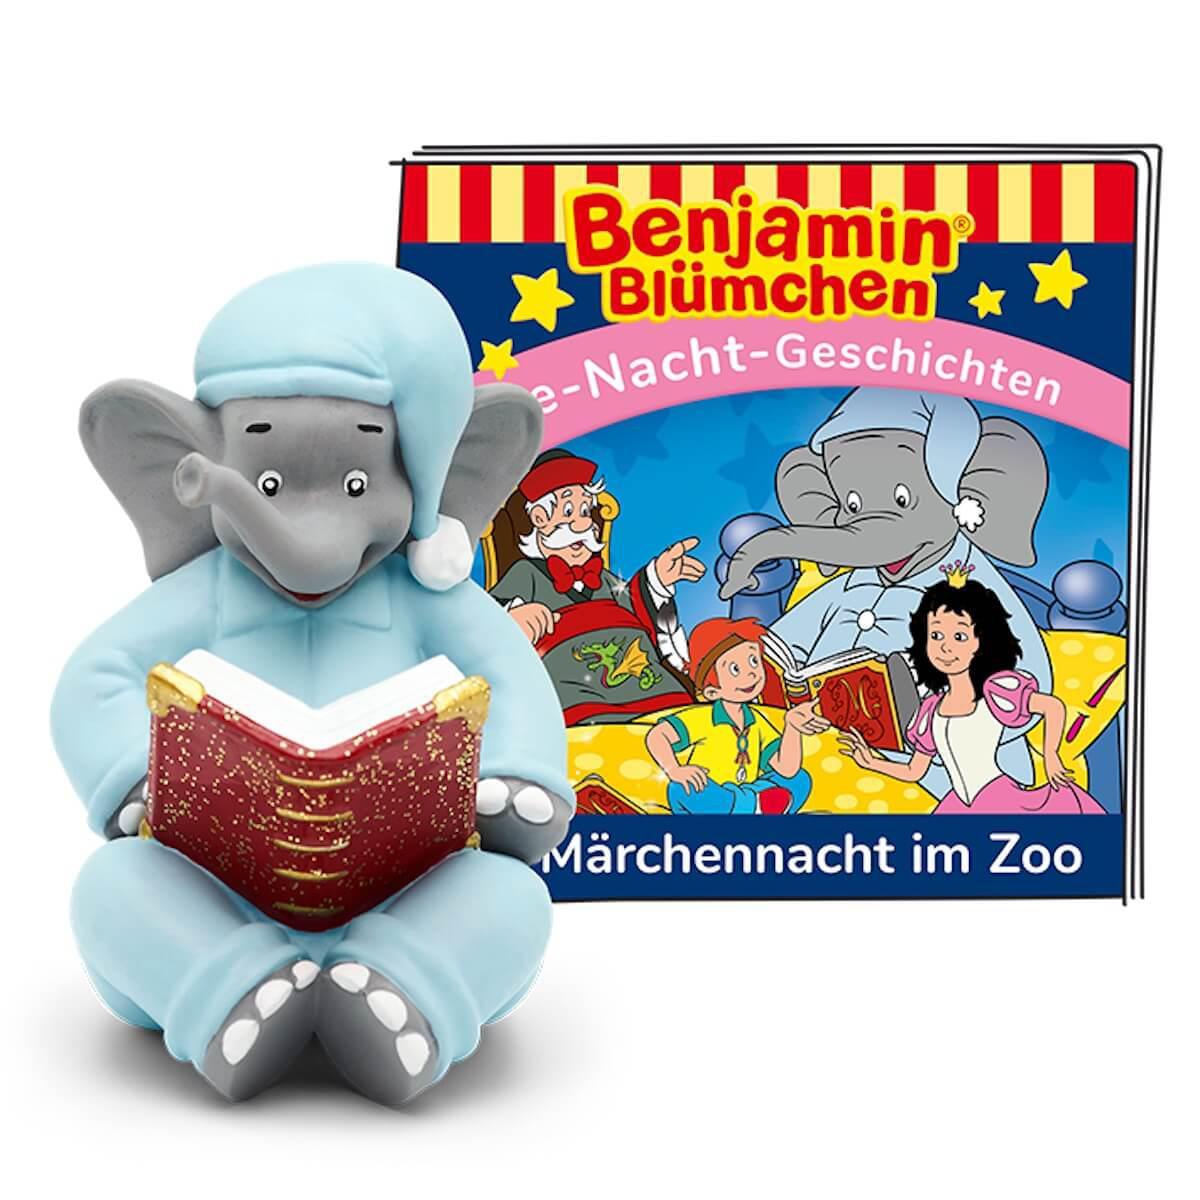 Hörspielfigur TONIES Benjamin Blümchen Märchennacht im Zoo